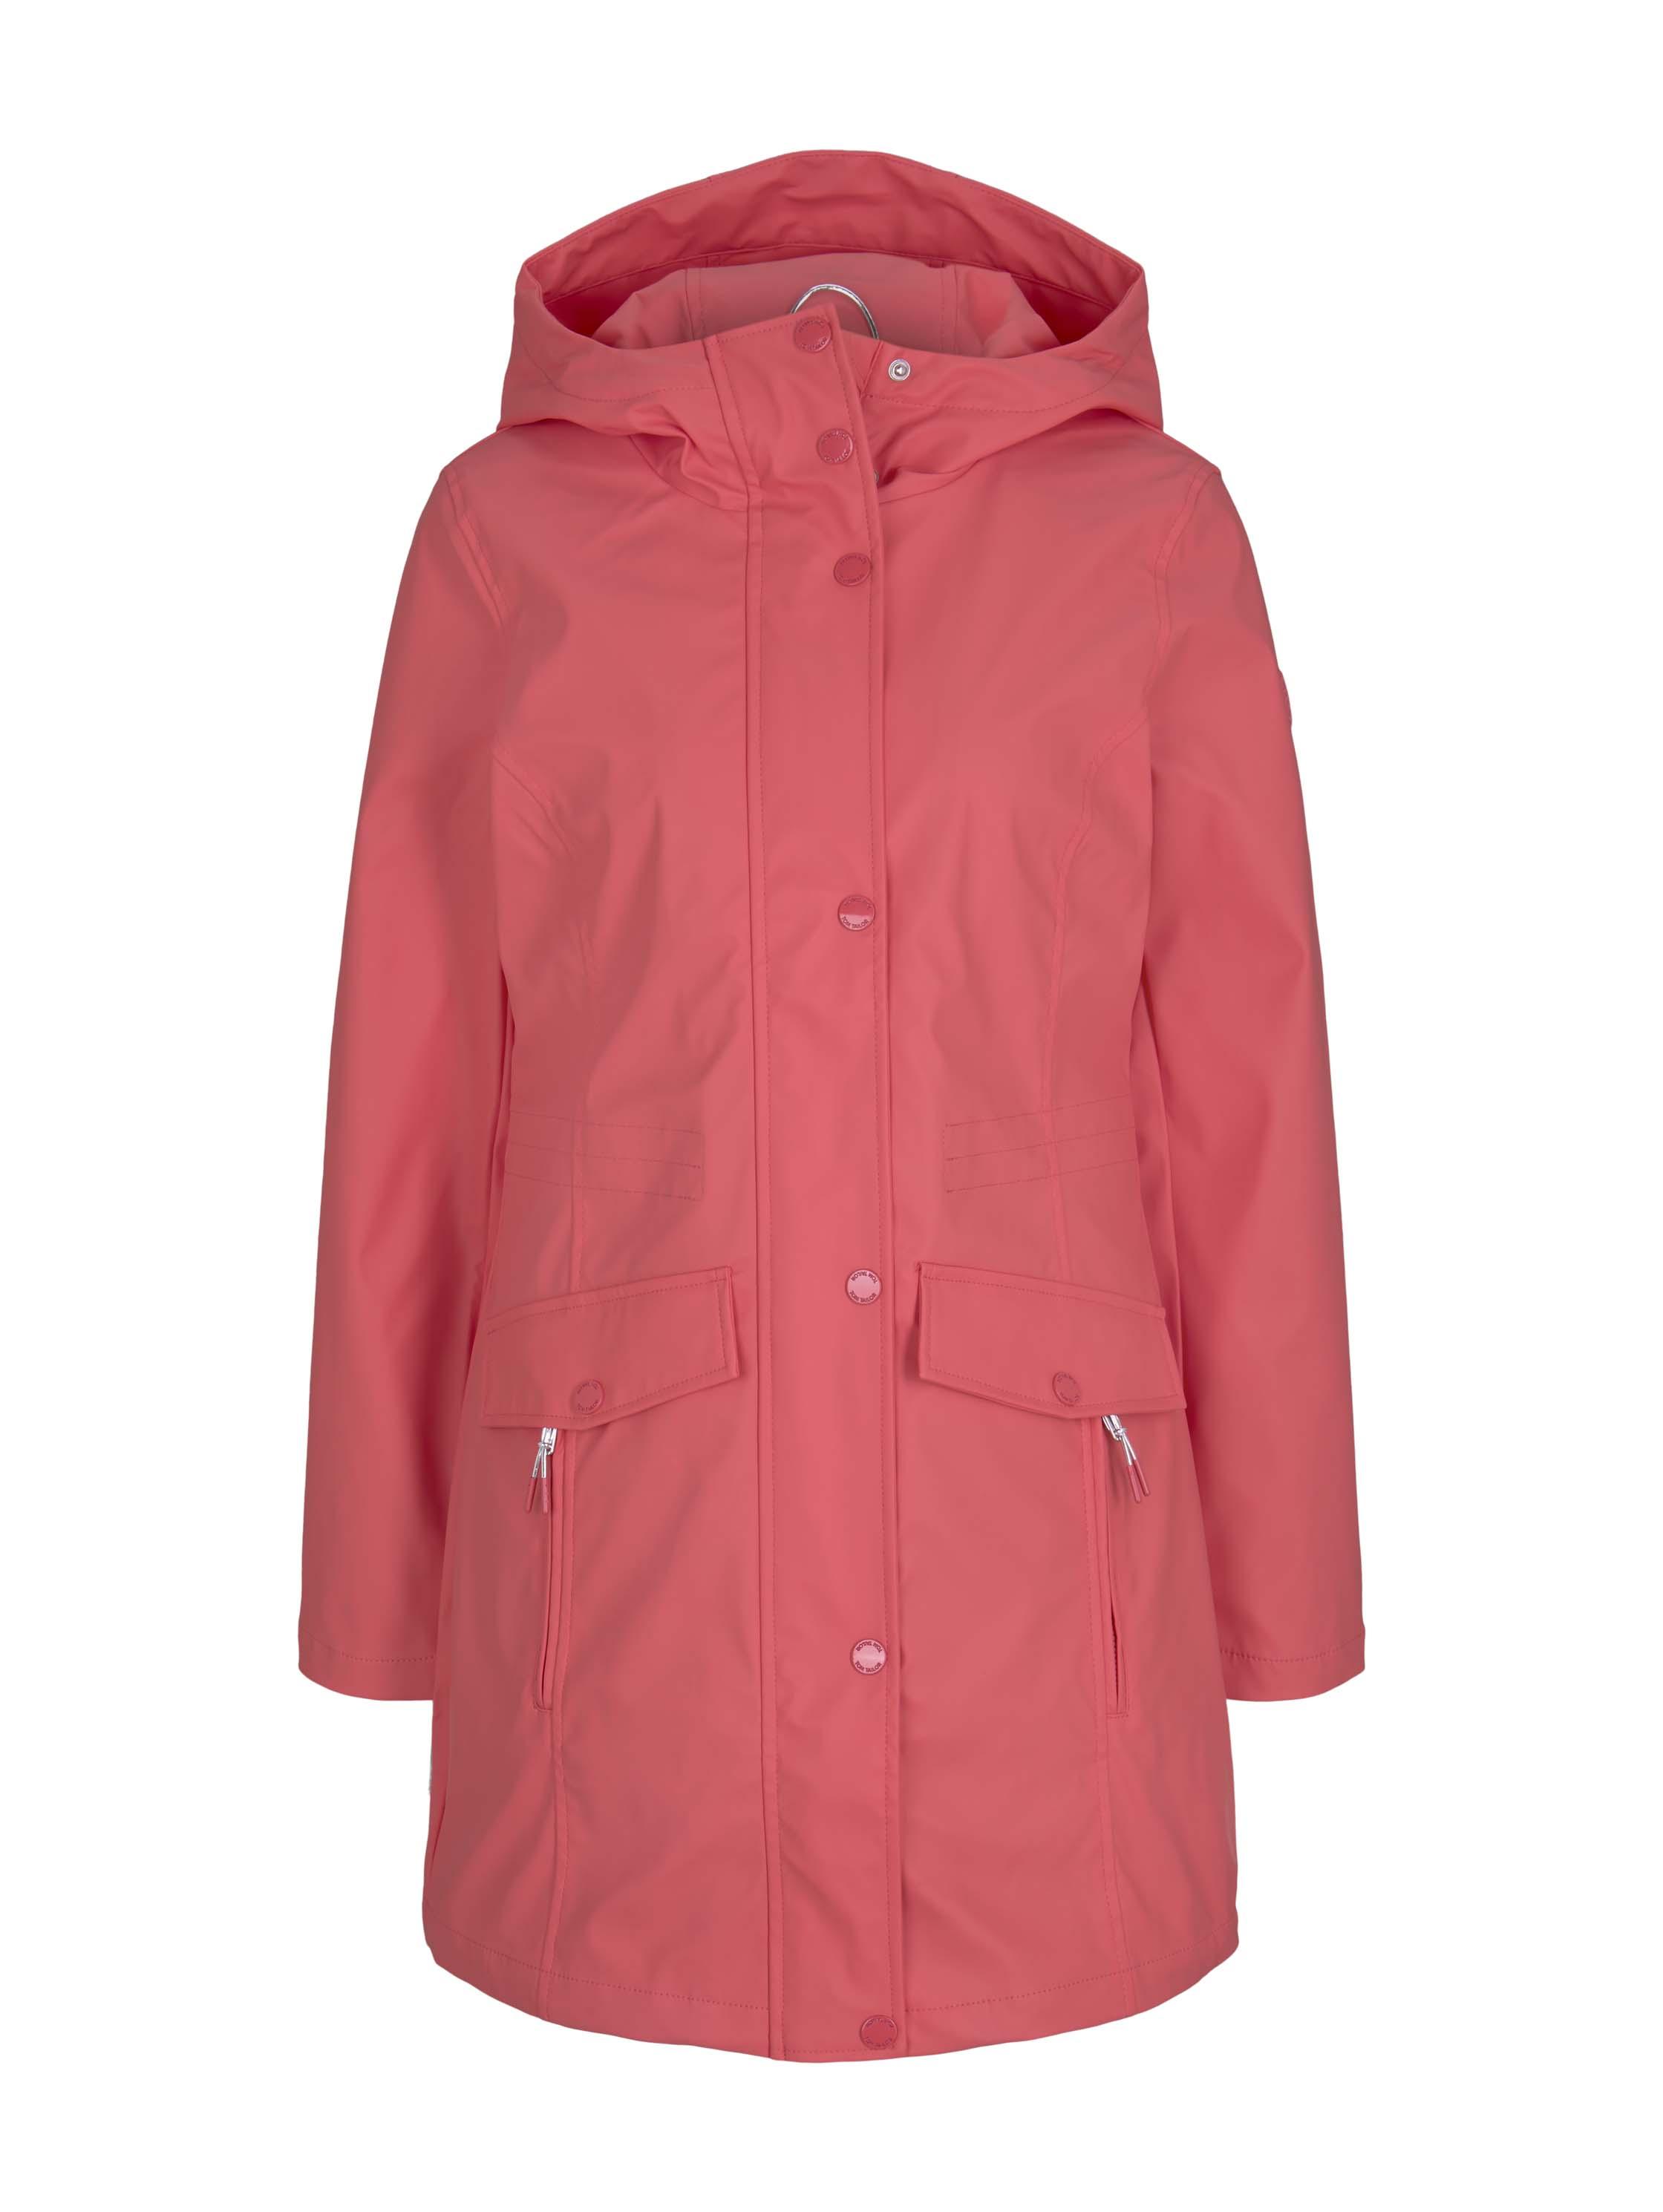 easy raincoat